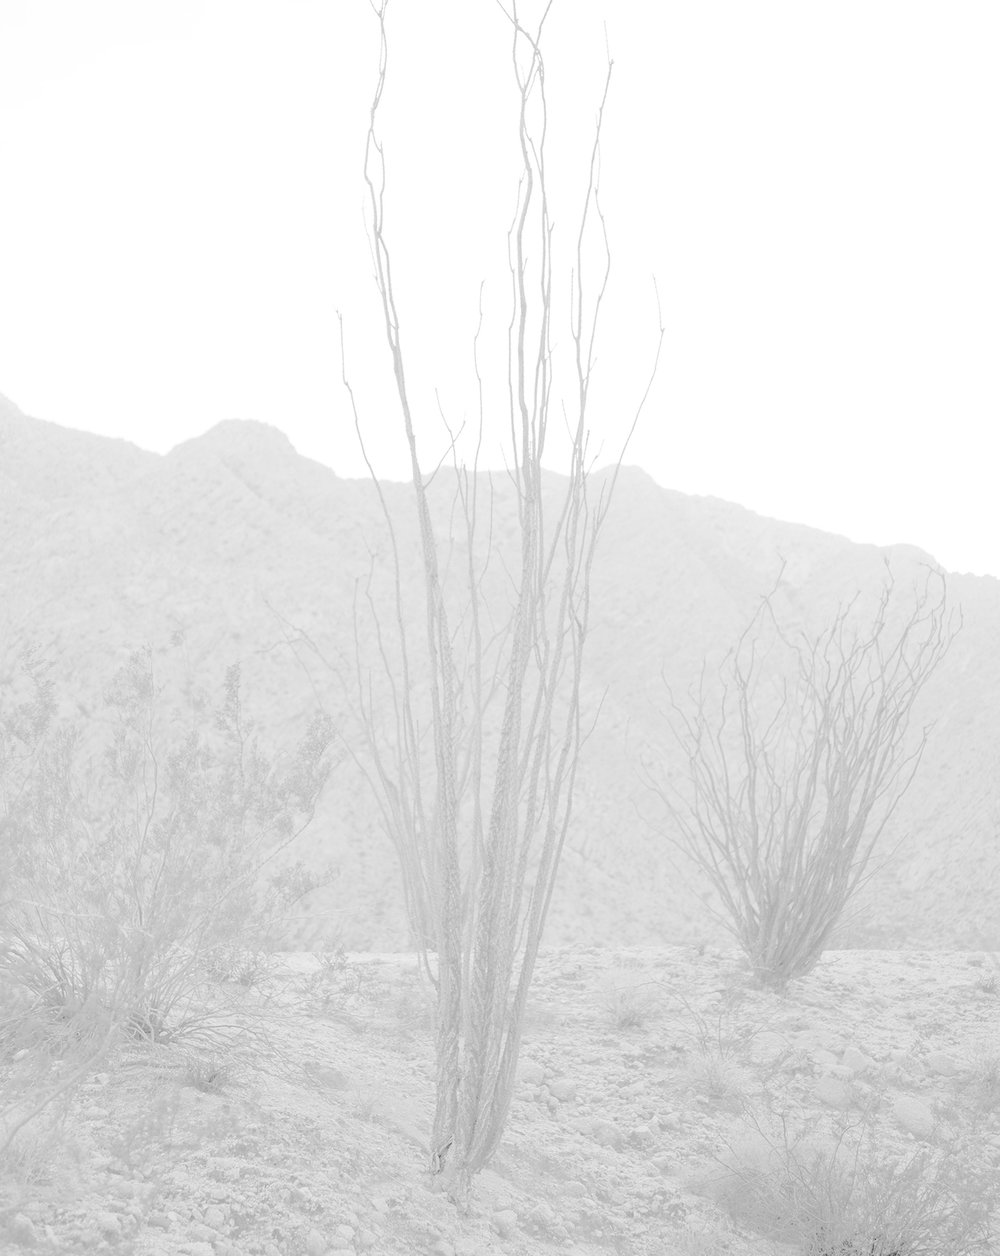 scott b. davis  ocotillo, ocotillo (no. 27), 2016/2016 palladium print 20 x 16 inches edition 1/5